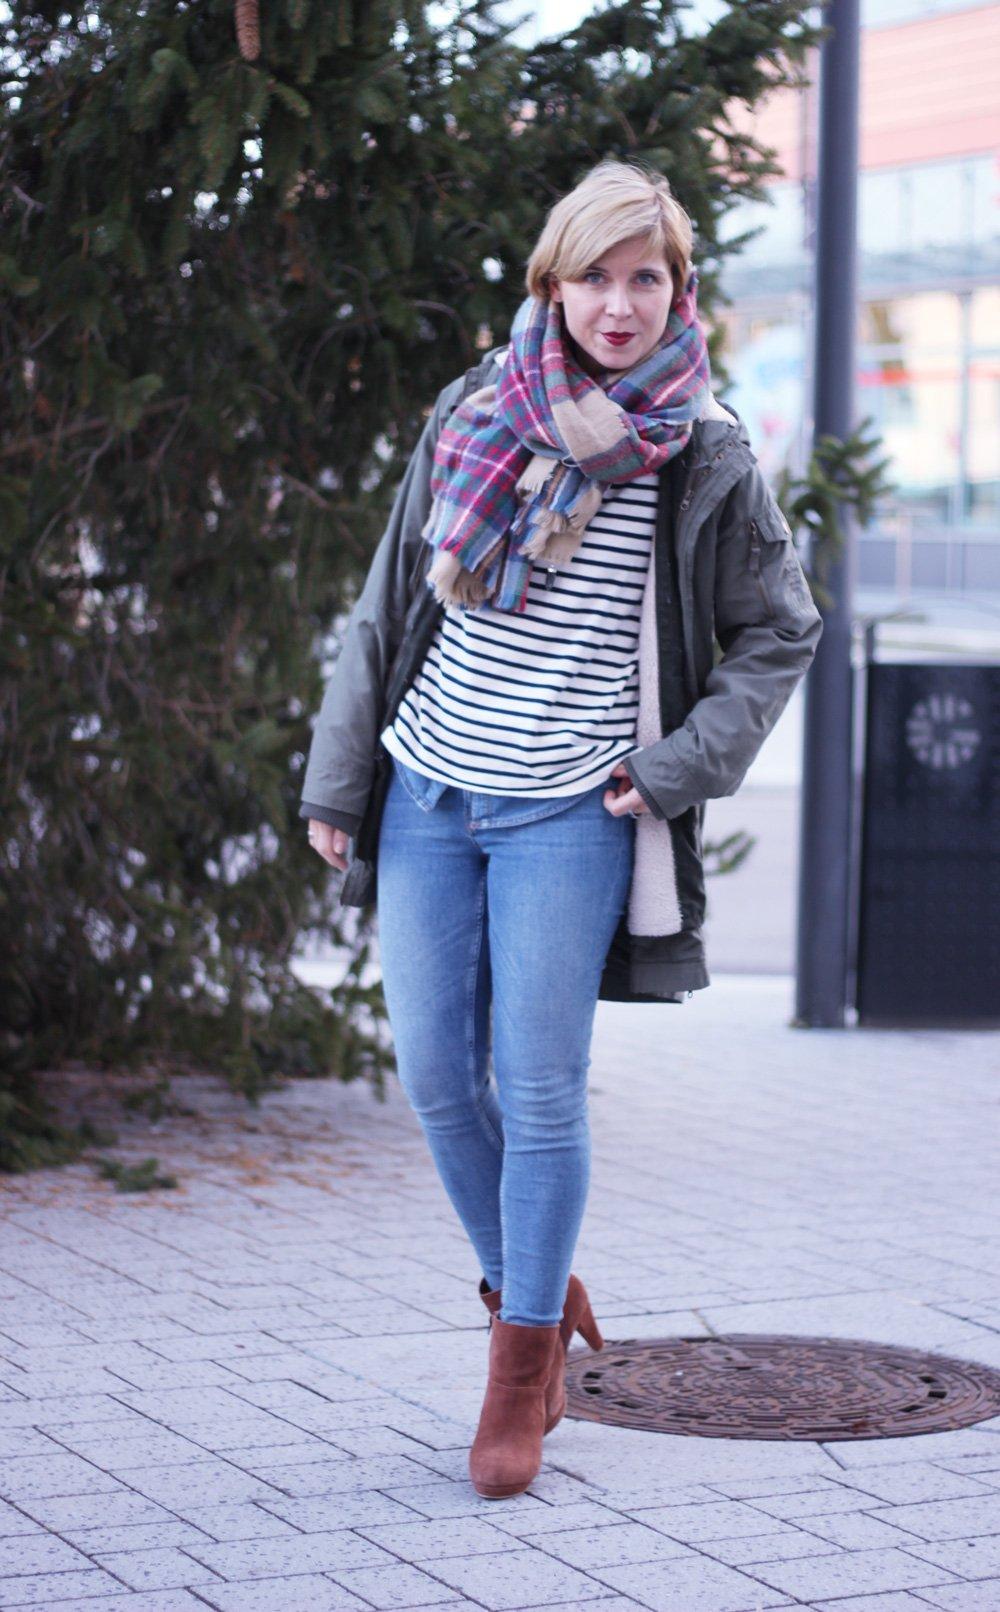 Jeanshemd, Parka, Stylingchallenge, Blau, oversized Schal, Streifenpullover, Neyo, Winter